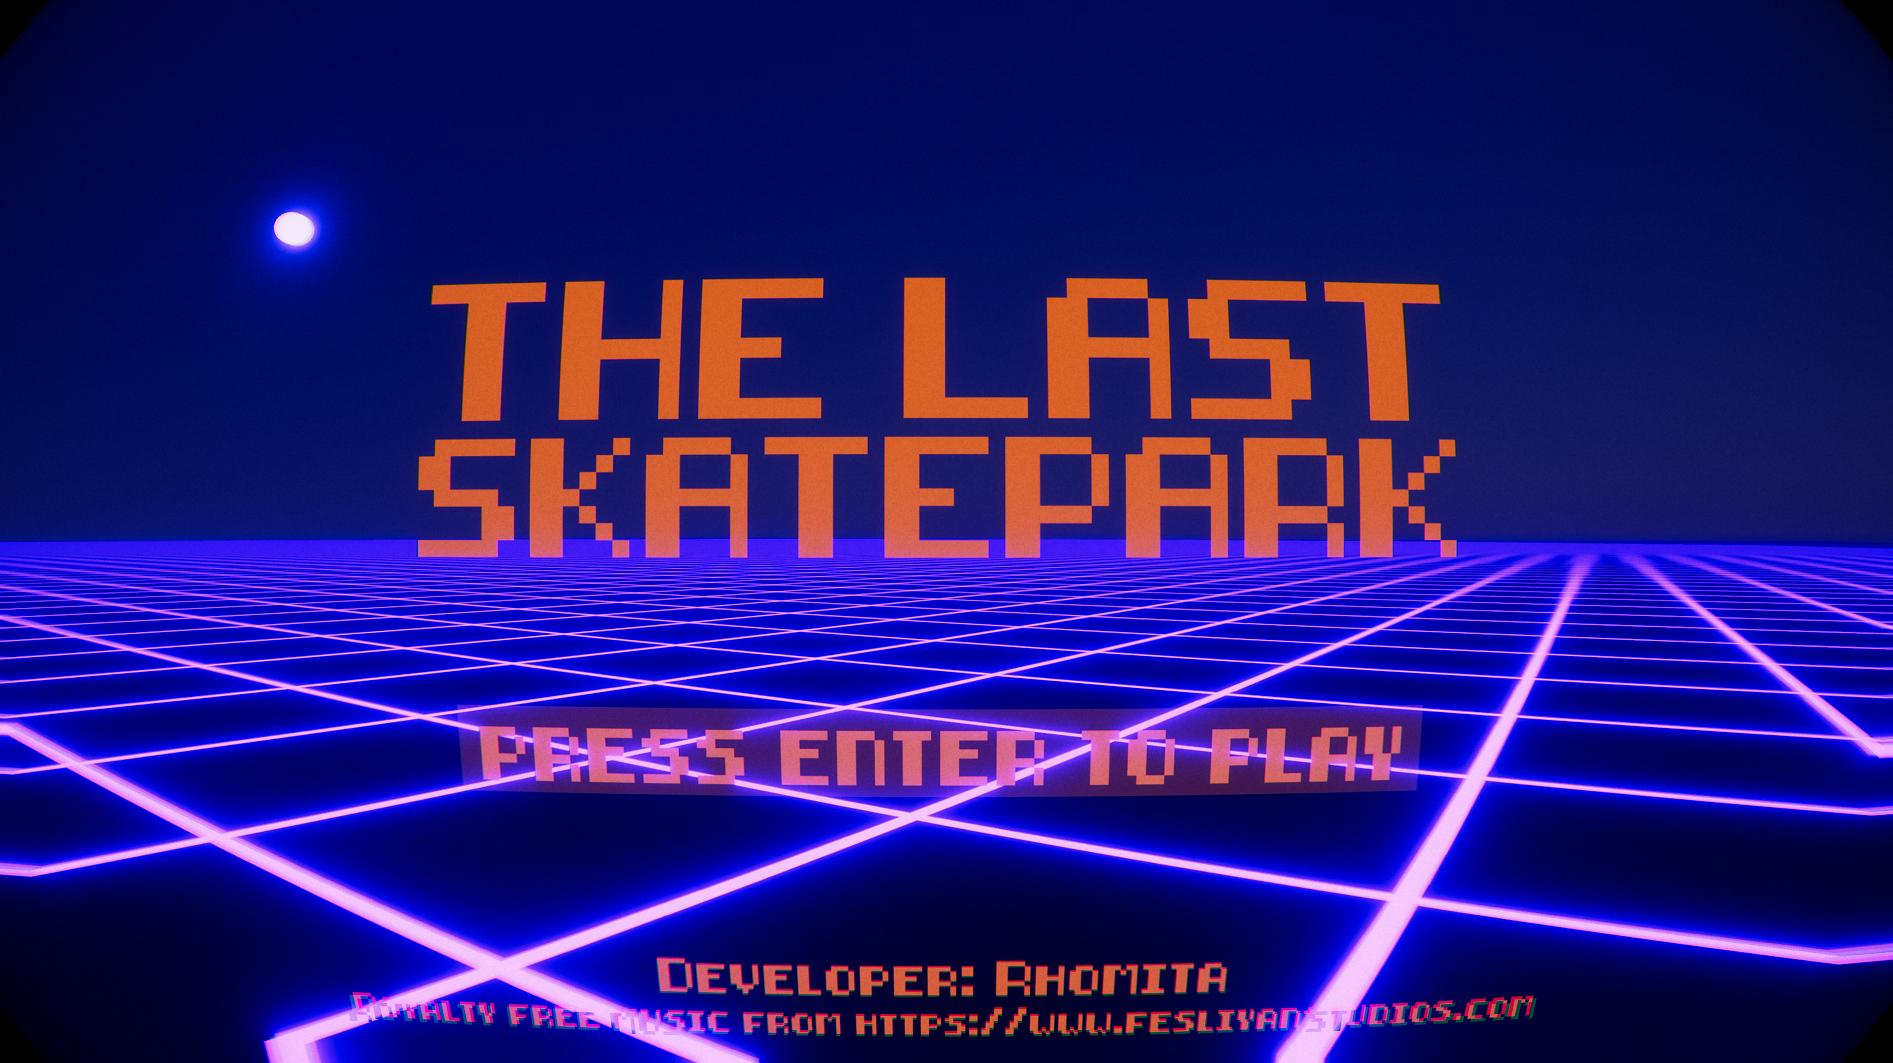 The Last Skatepark